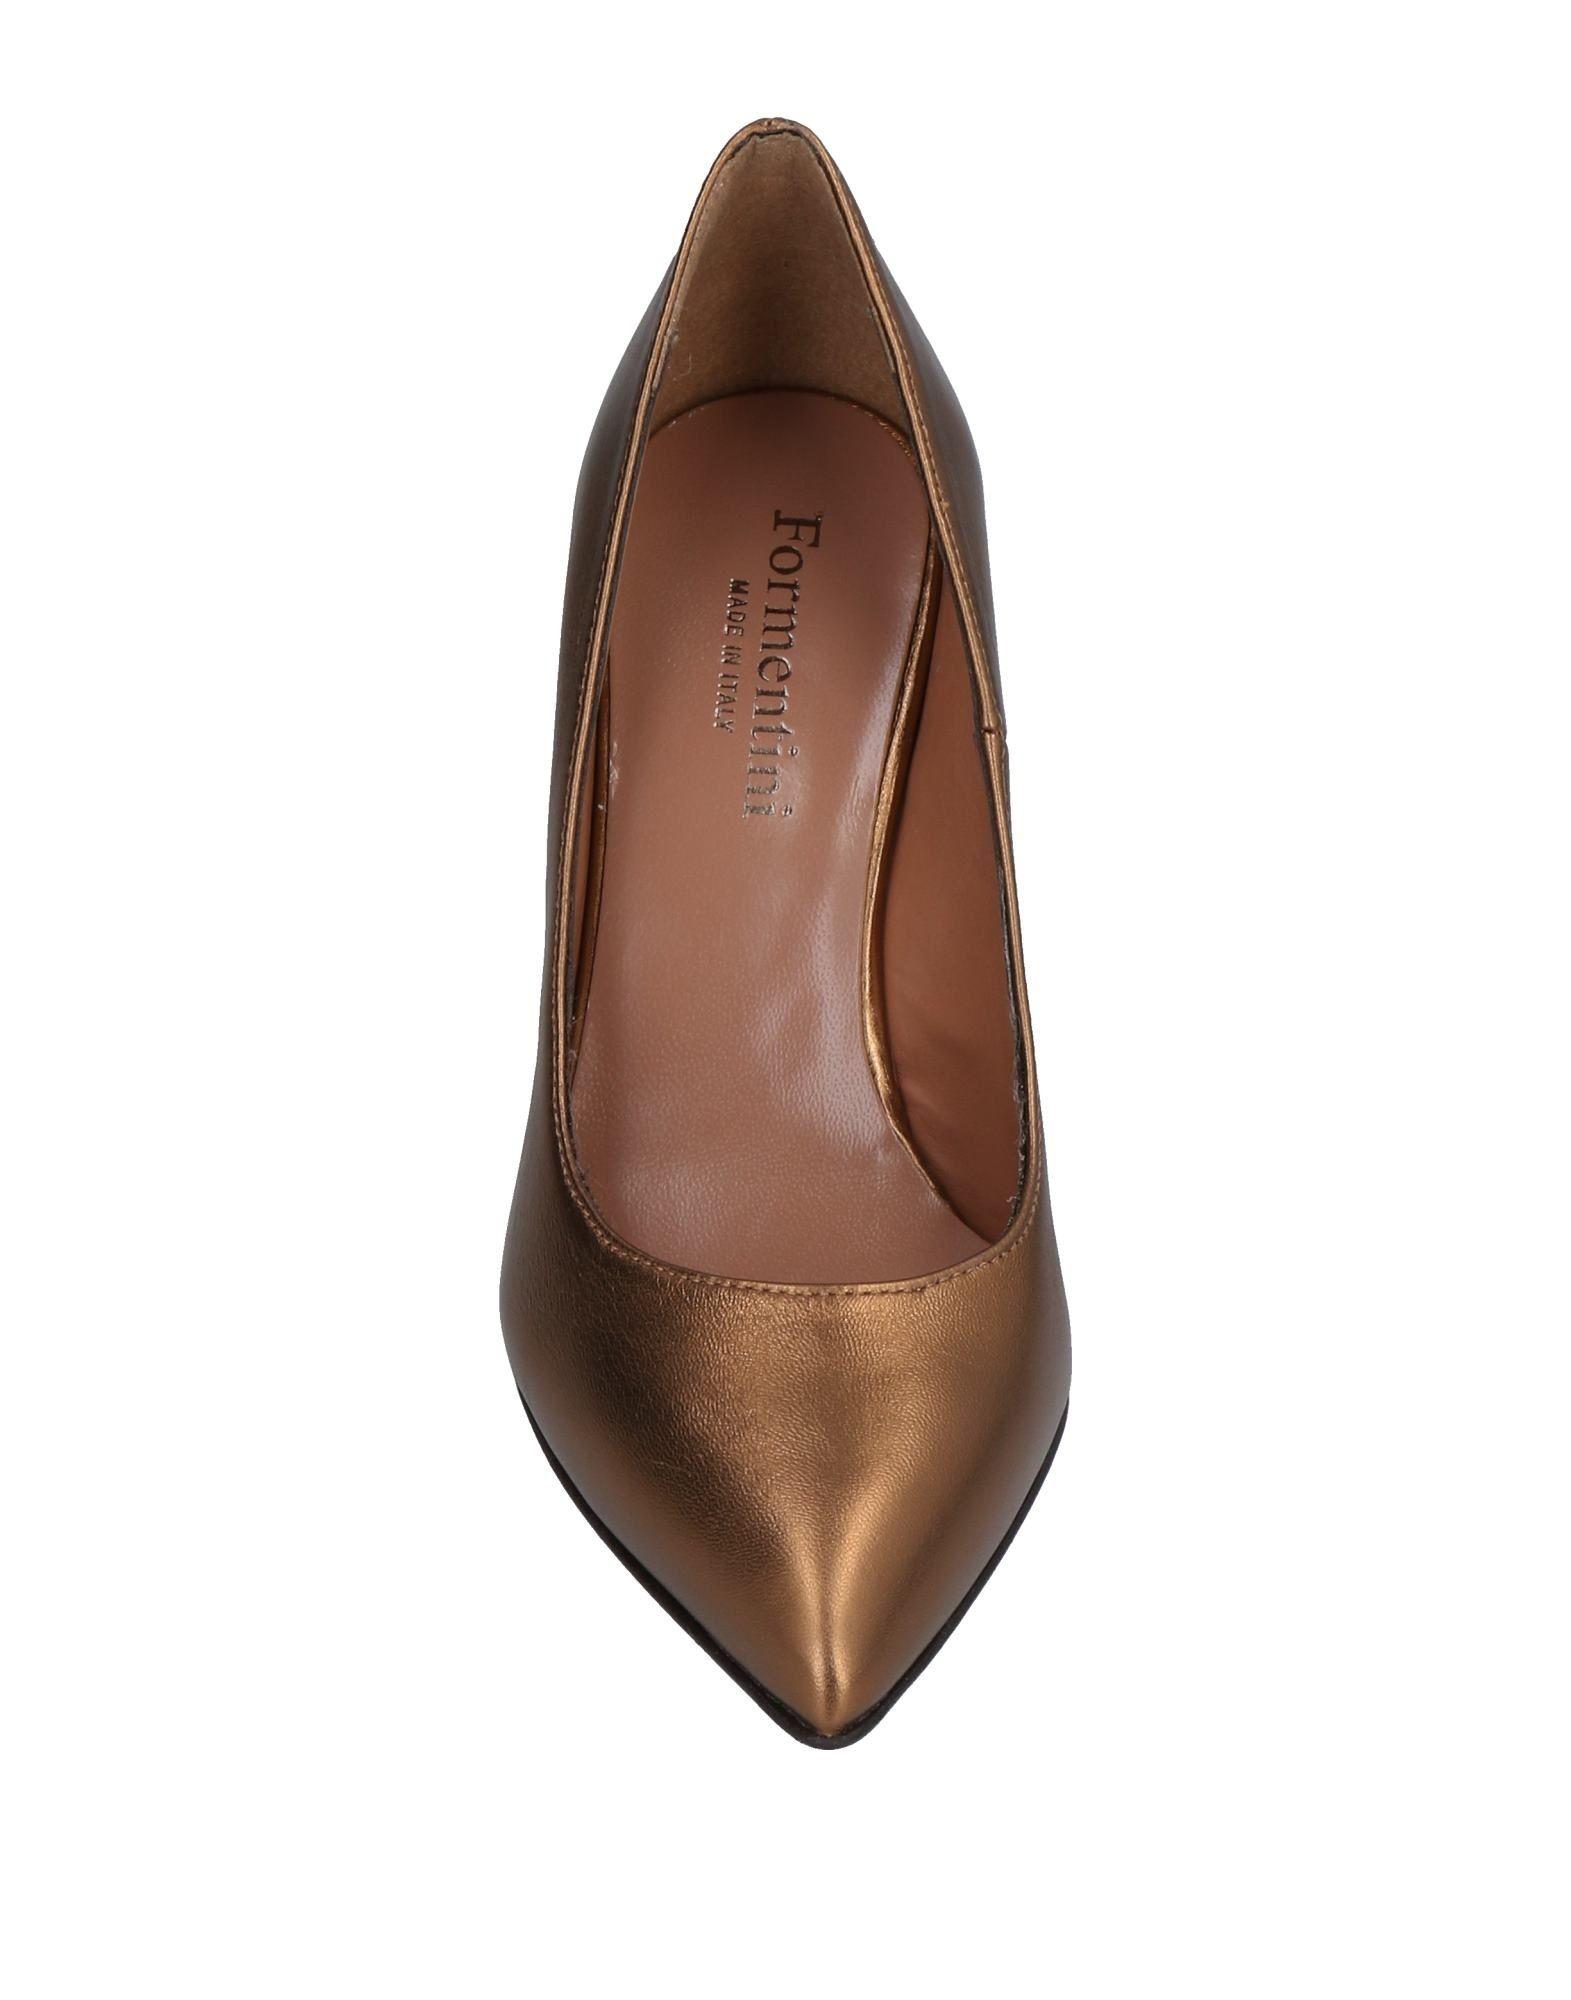 Formentini Pumps Damen Qualität  11479036PP Gute Qualität Damen beliebte Schuhe d4fa83